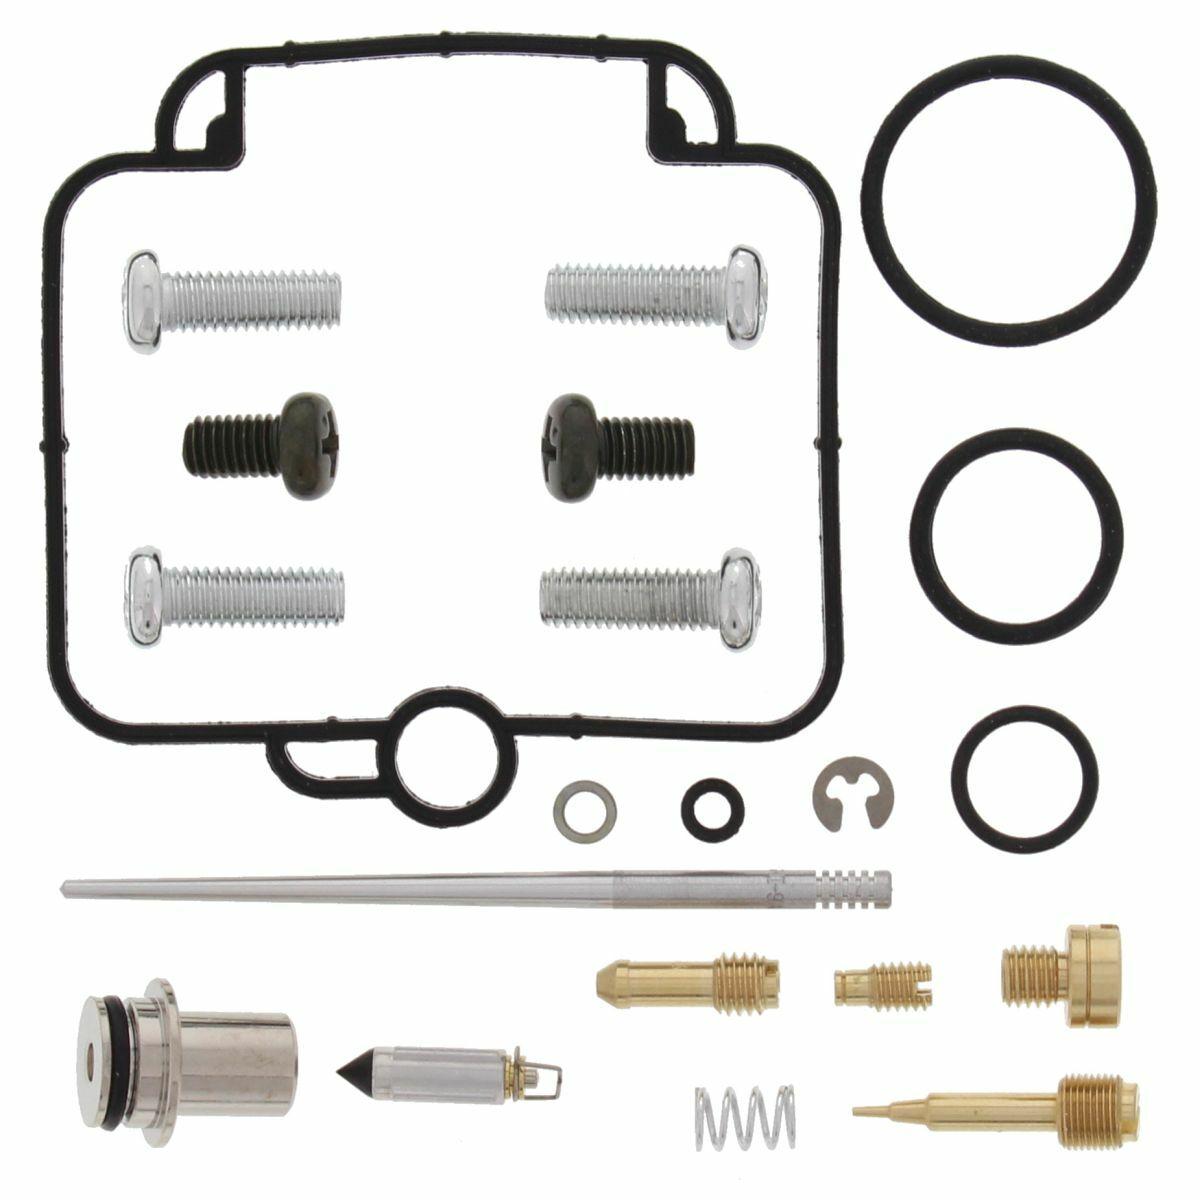 Obrázek produktu Carburetor Rebuild Kit All Balls Racing 26-1012